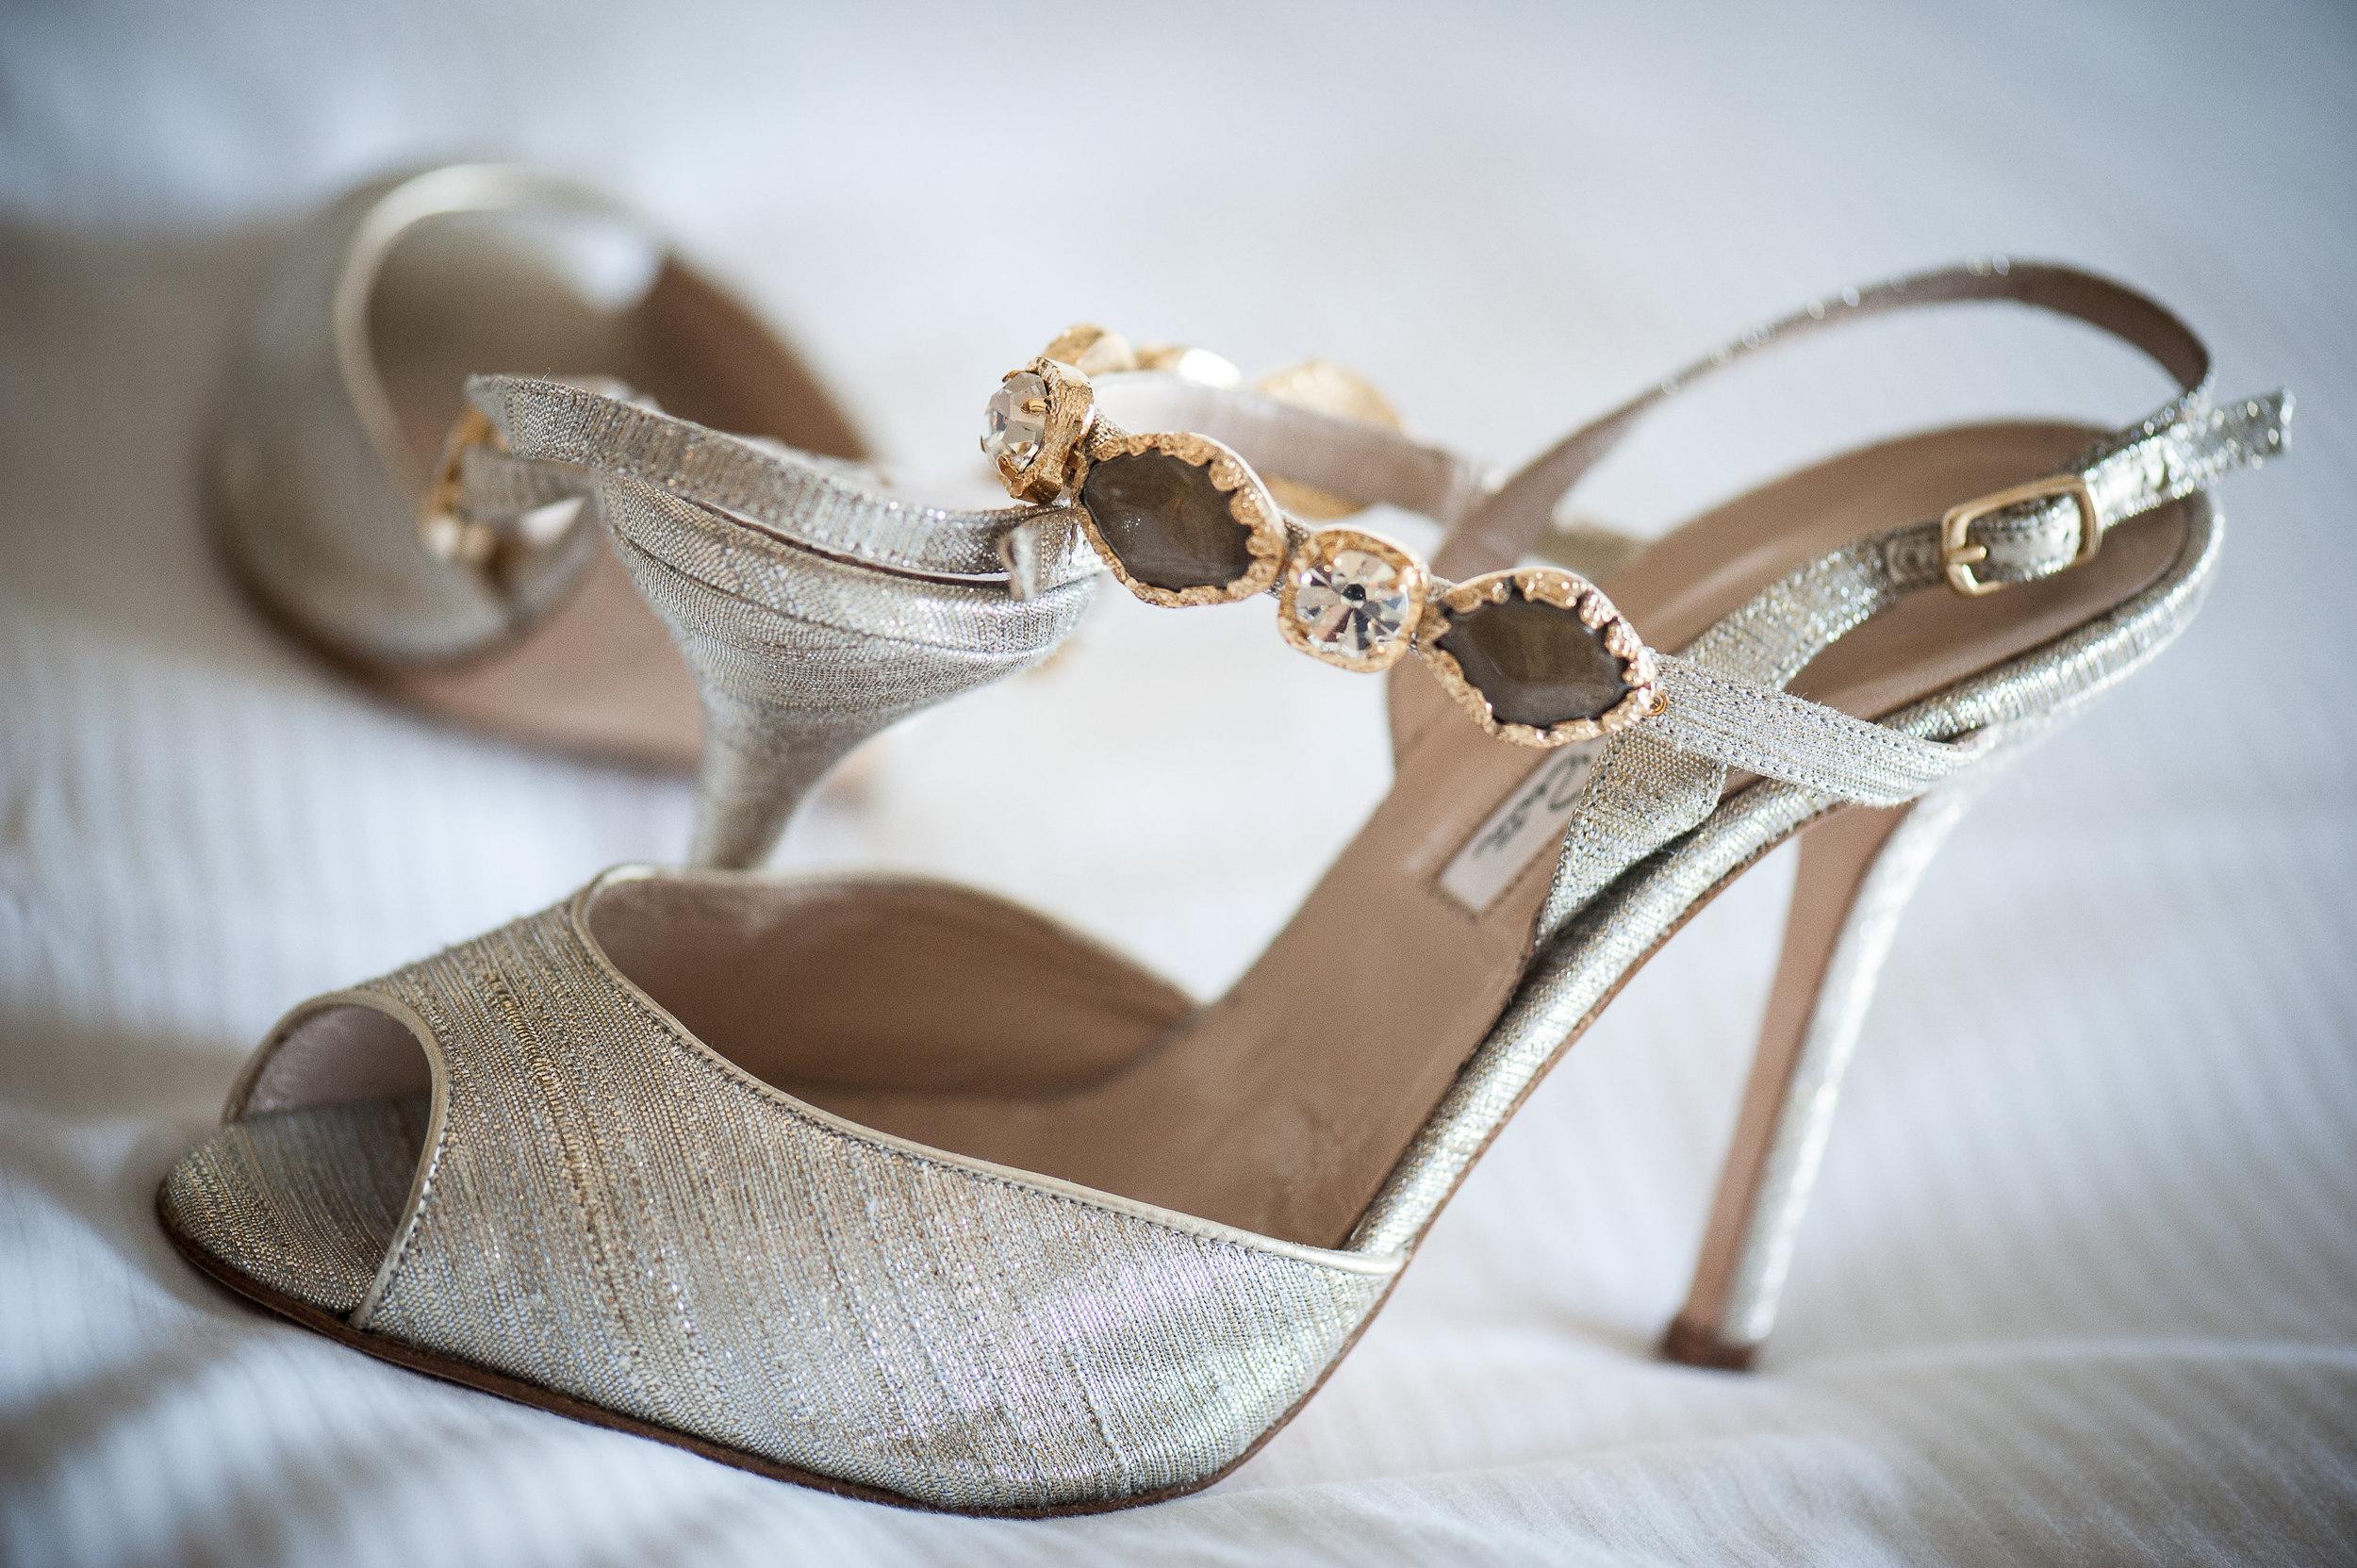 santabarbarawedding.com | Photo: By Cherry | Santa Barbara Courthouse wedding ideas